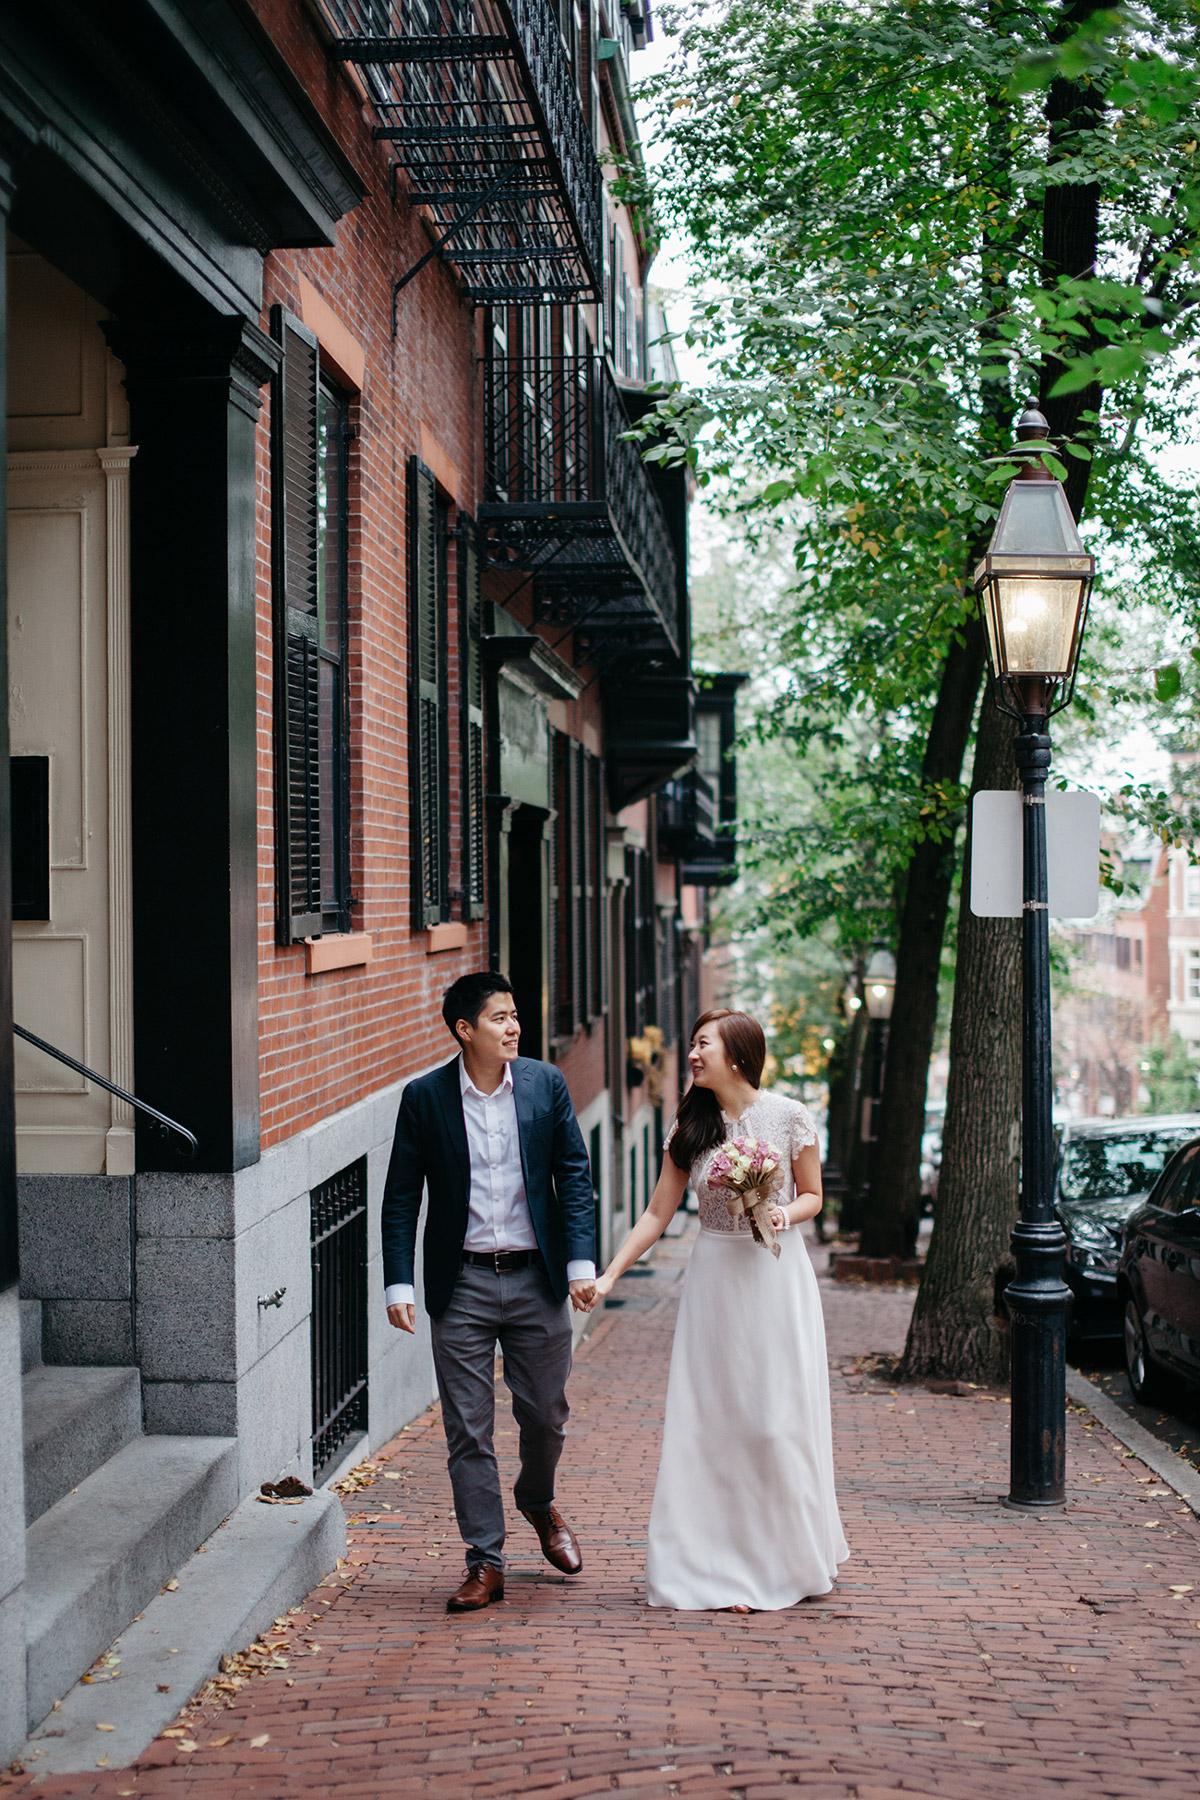 Beacon Hill engagement photography, Boston MA